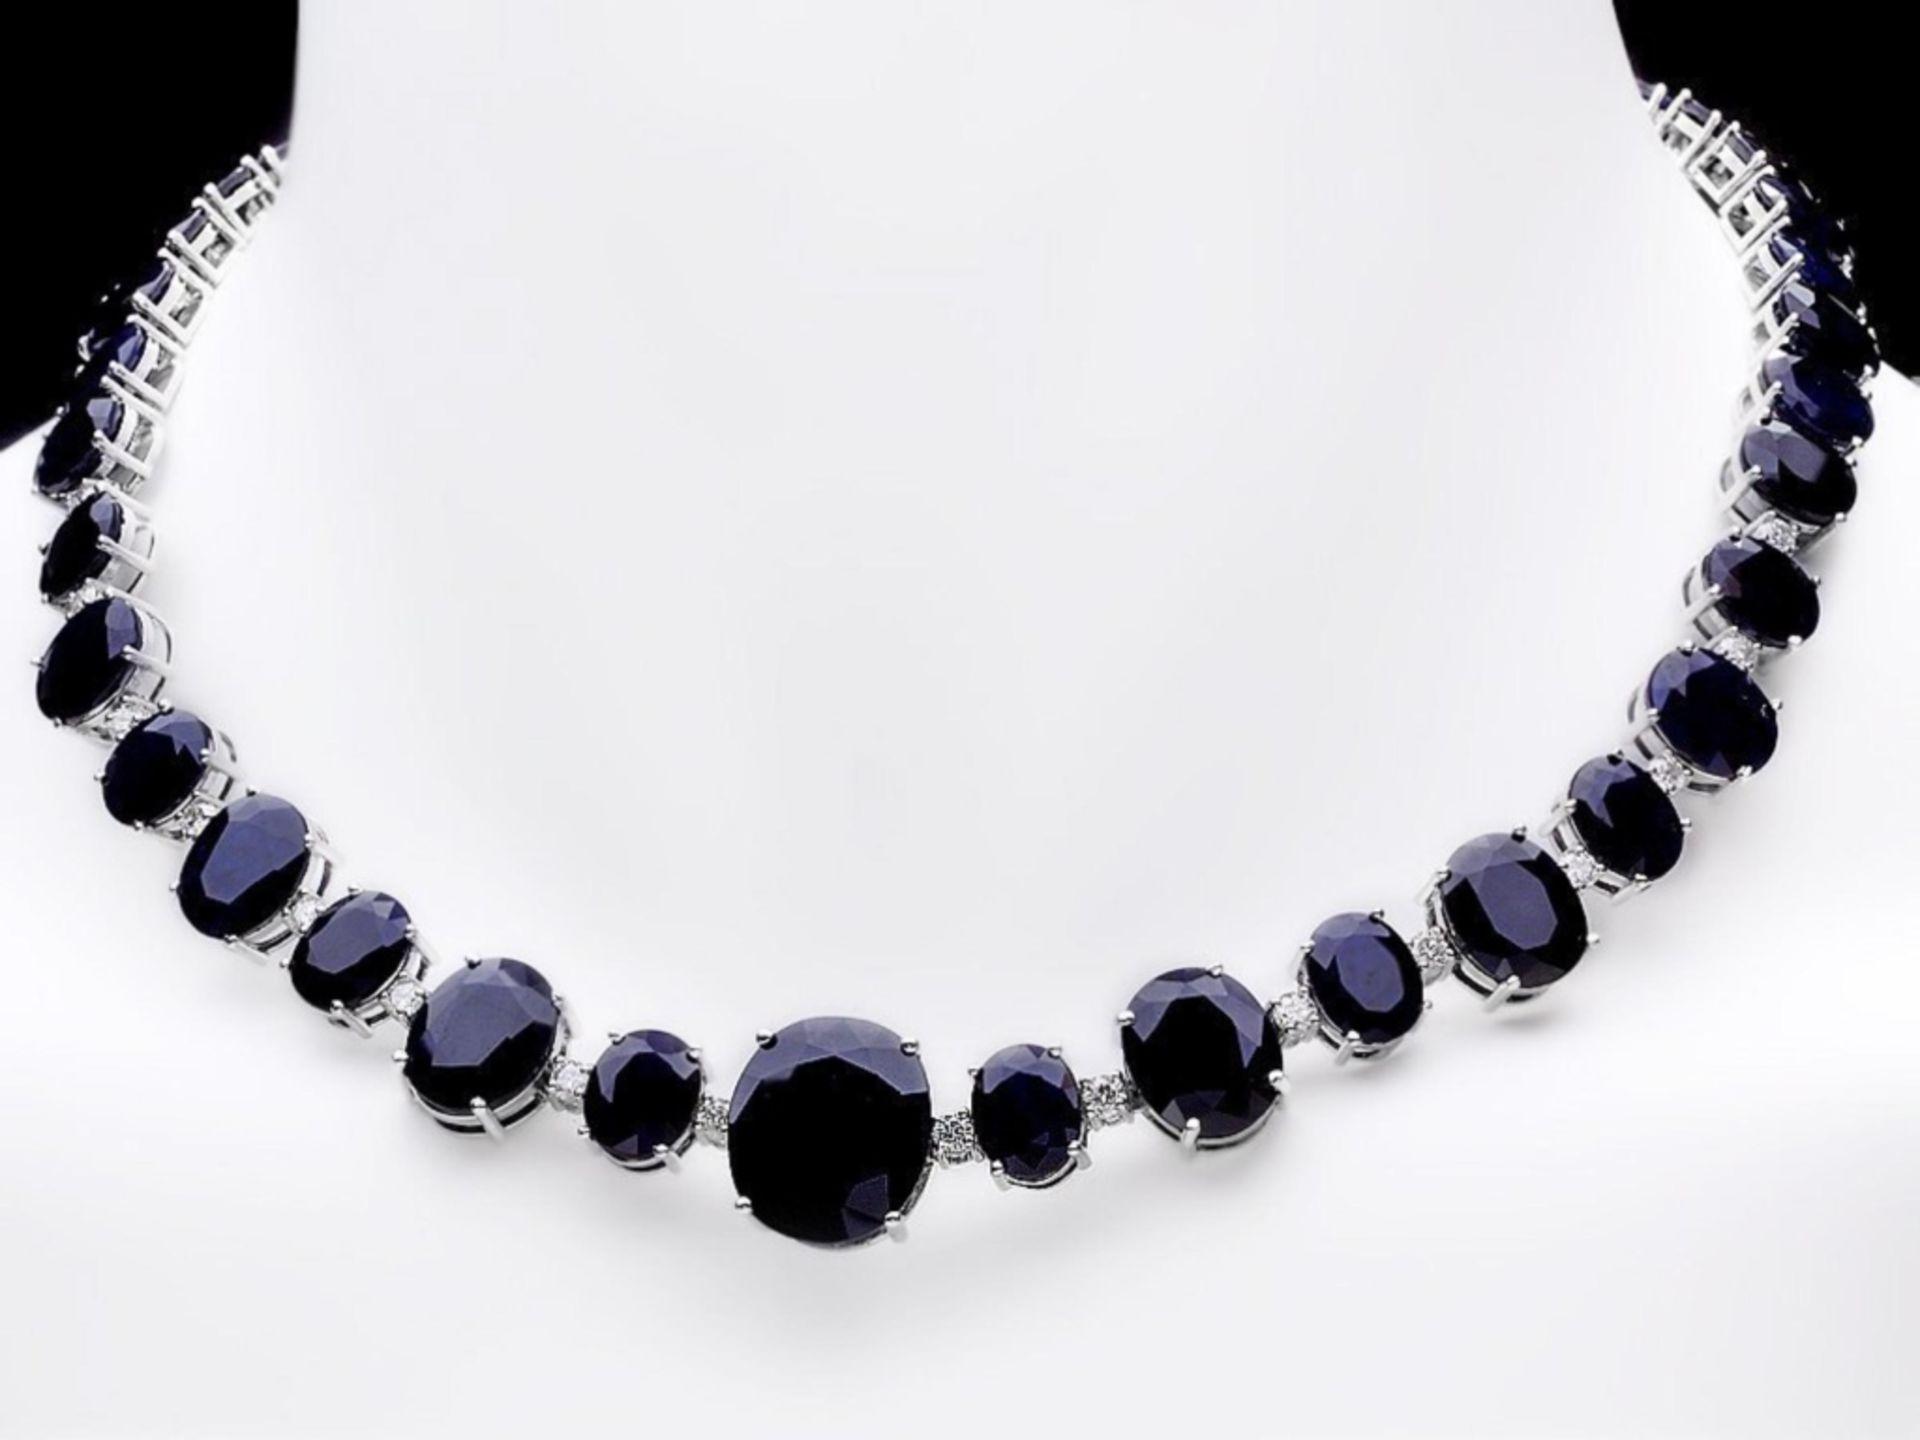 `14k Gold 170.00ct Sapphire & 2.00ct Diamond Neckl - Image 2 of 5